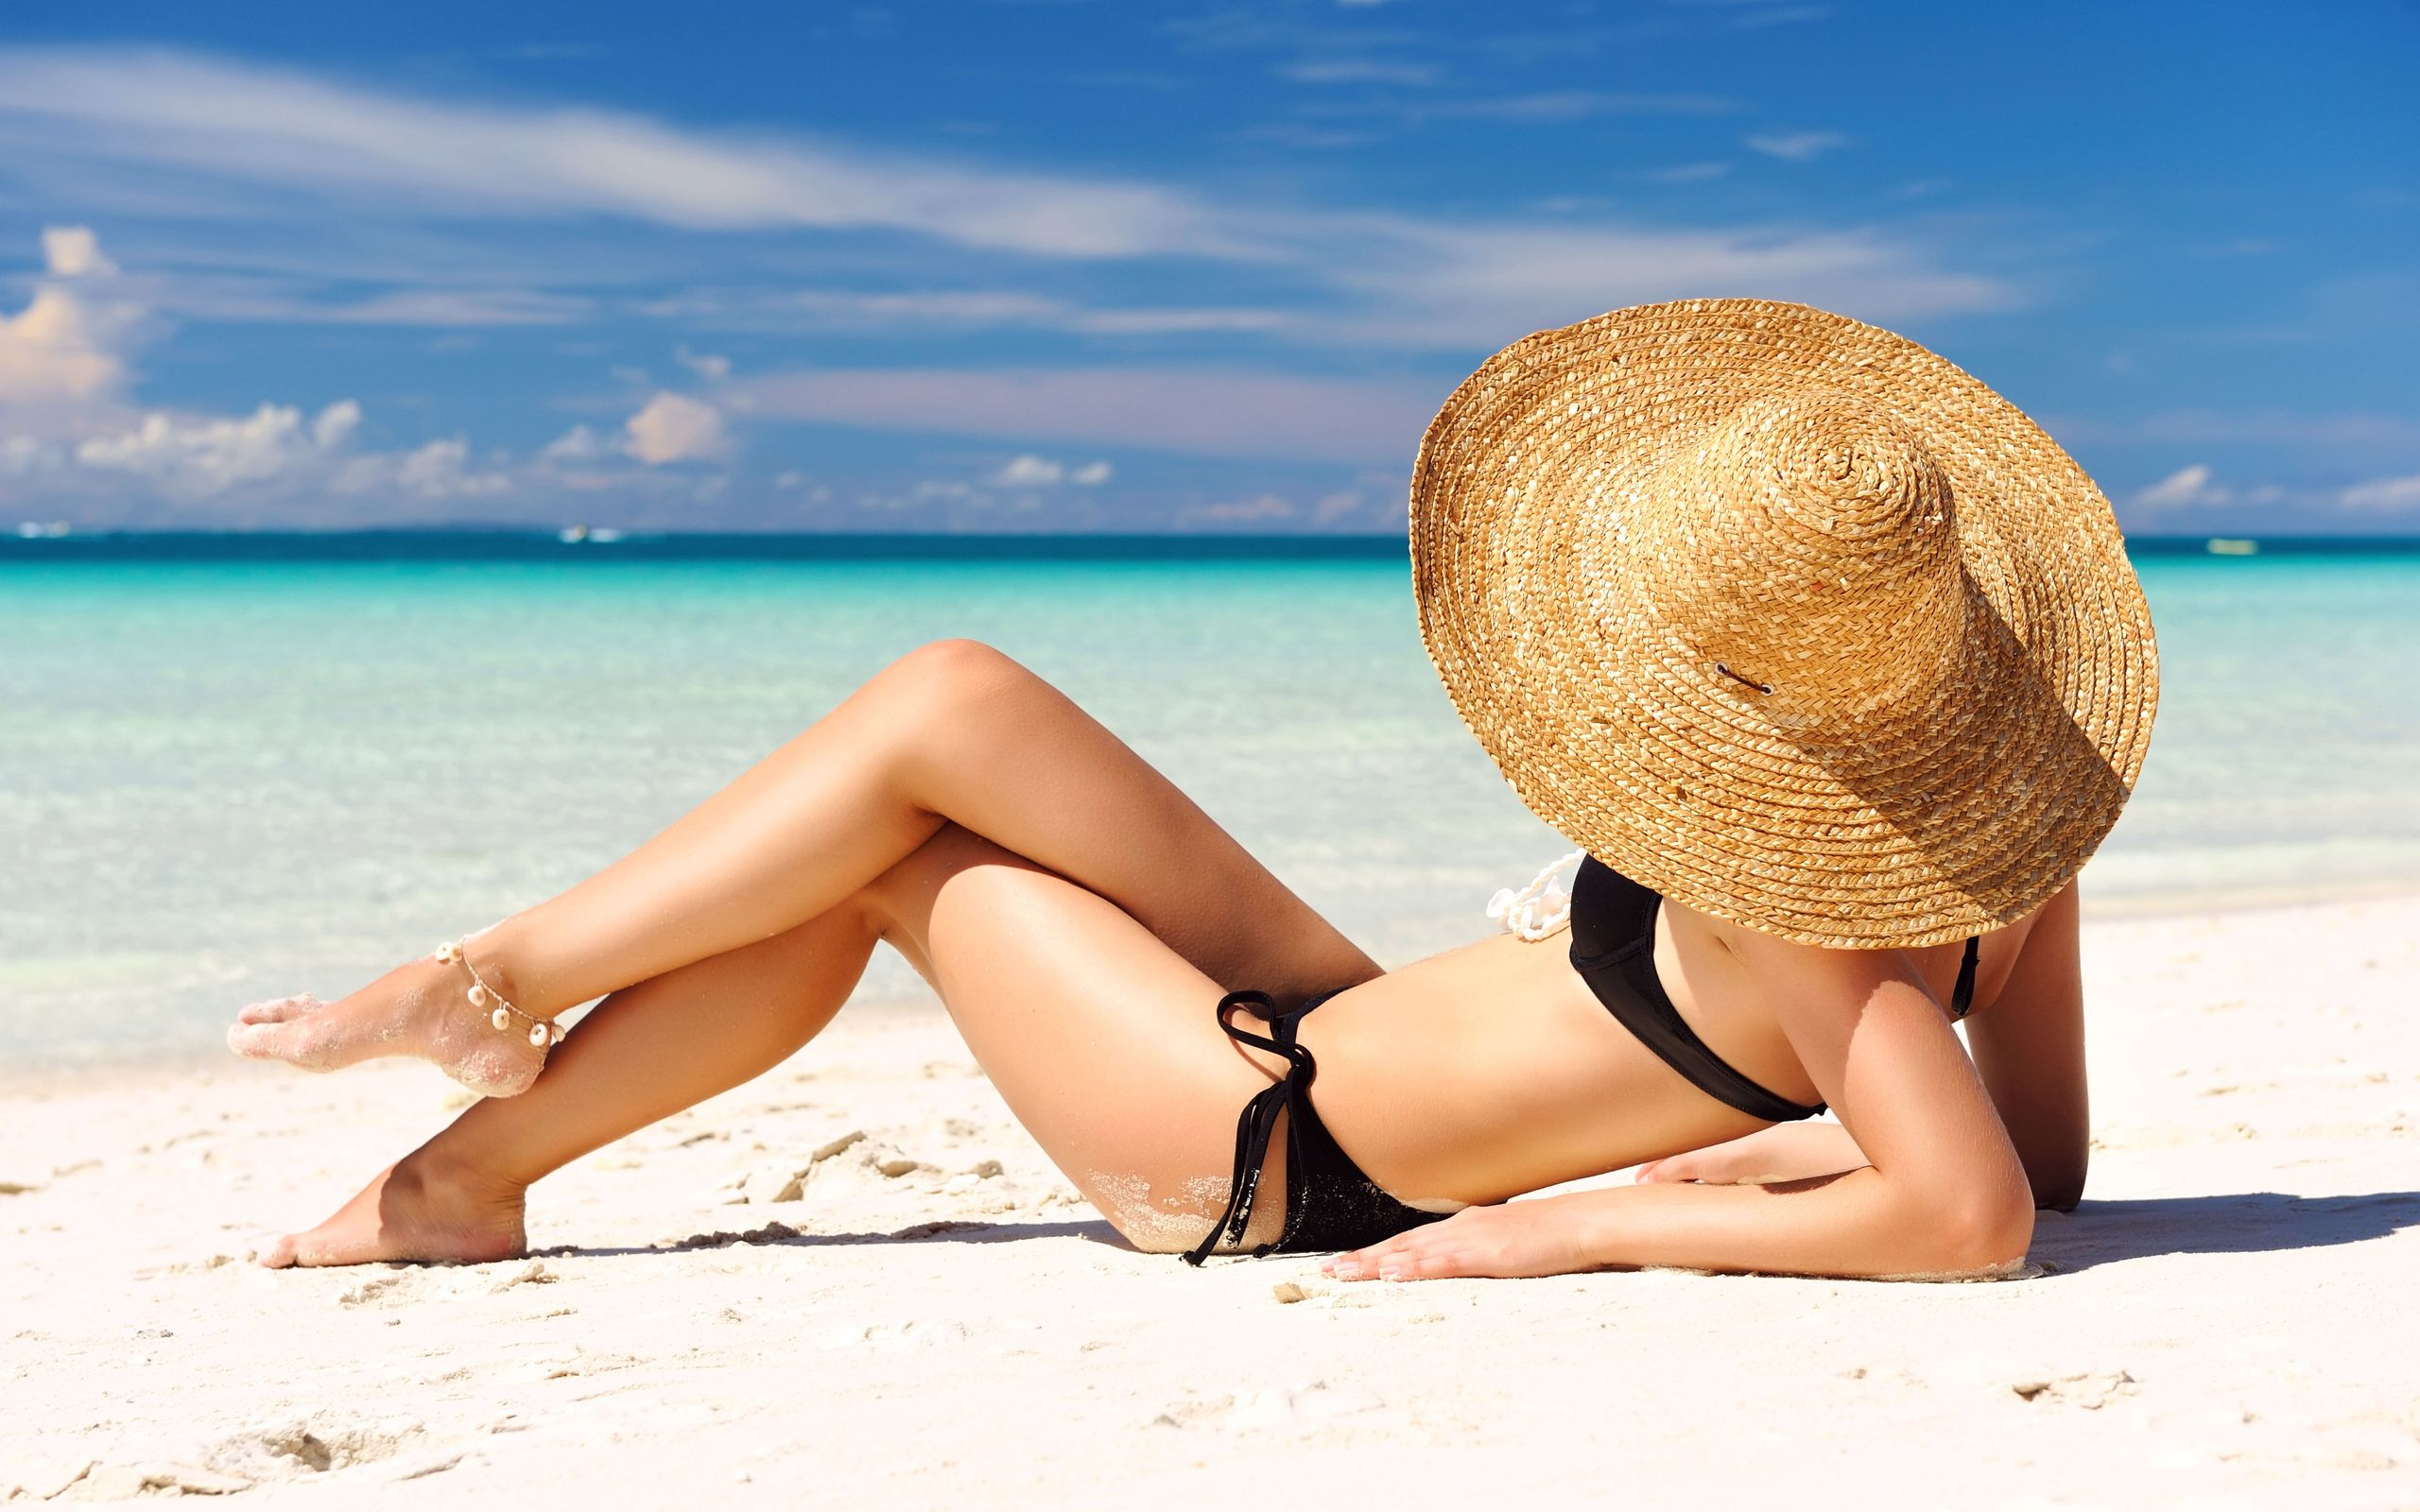 bikini full hd wallpaper and background image | 2560x1600 | id:154809